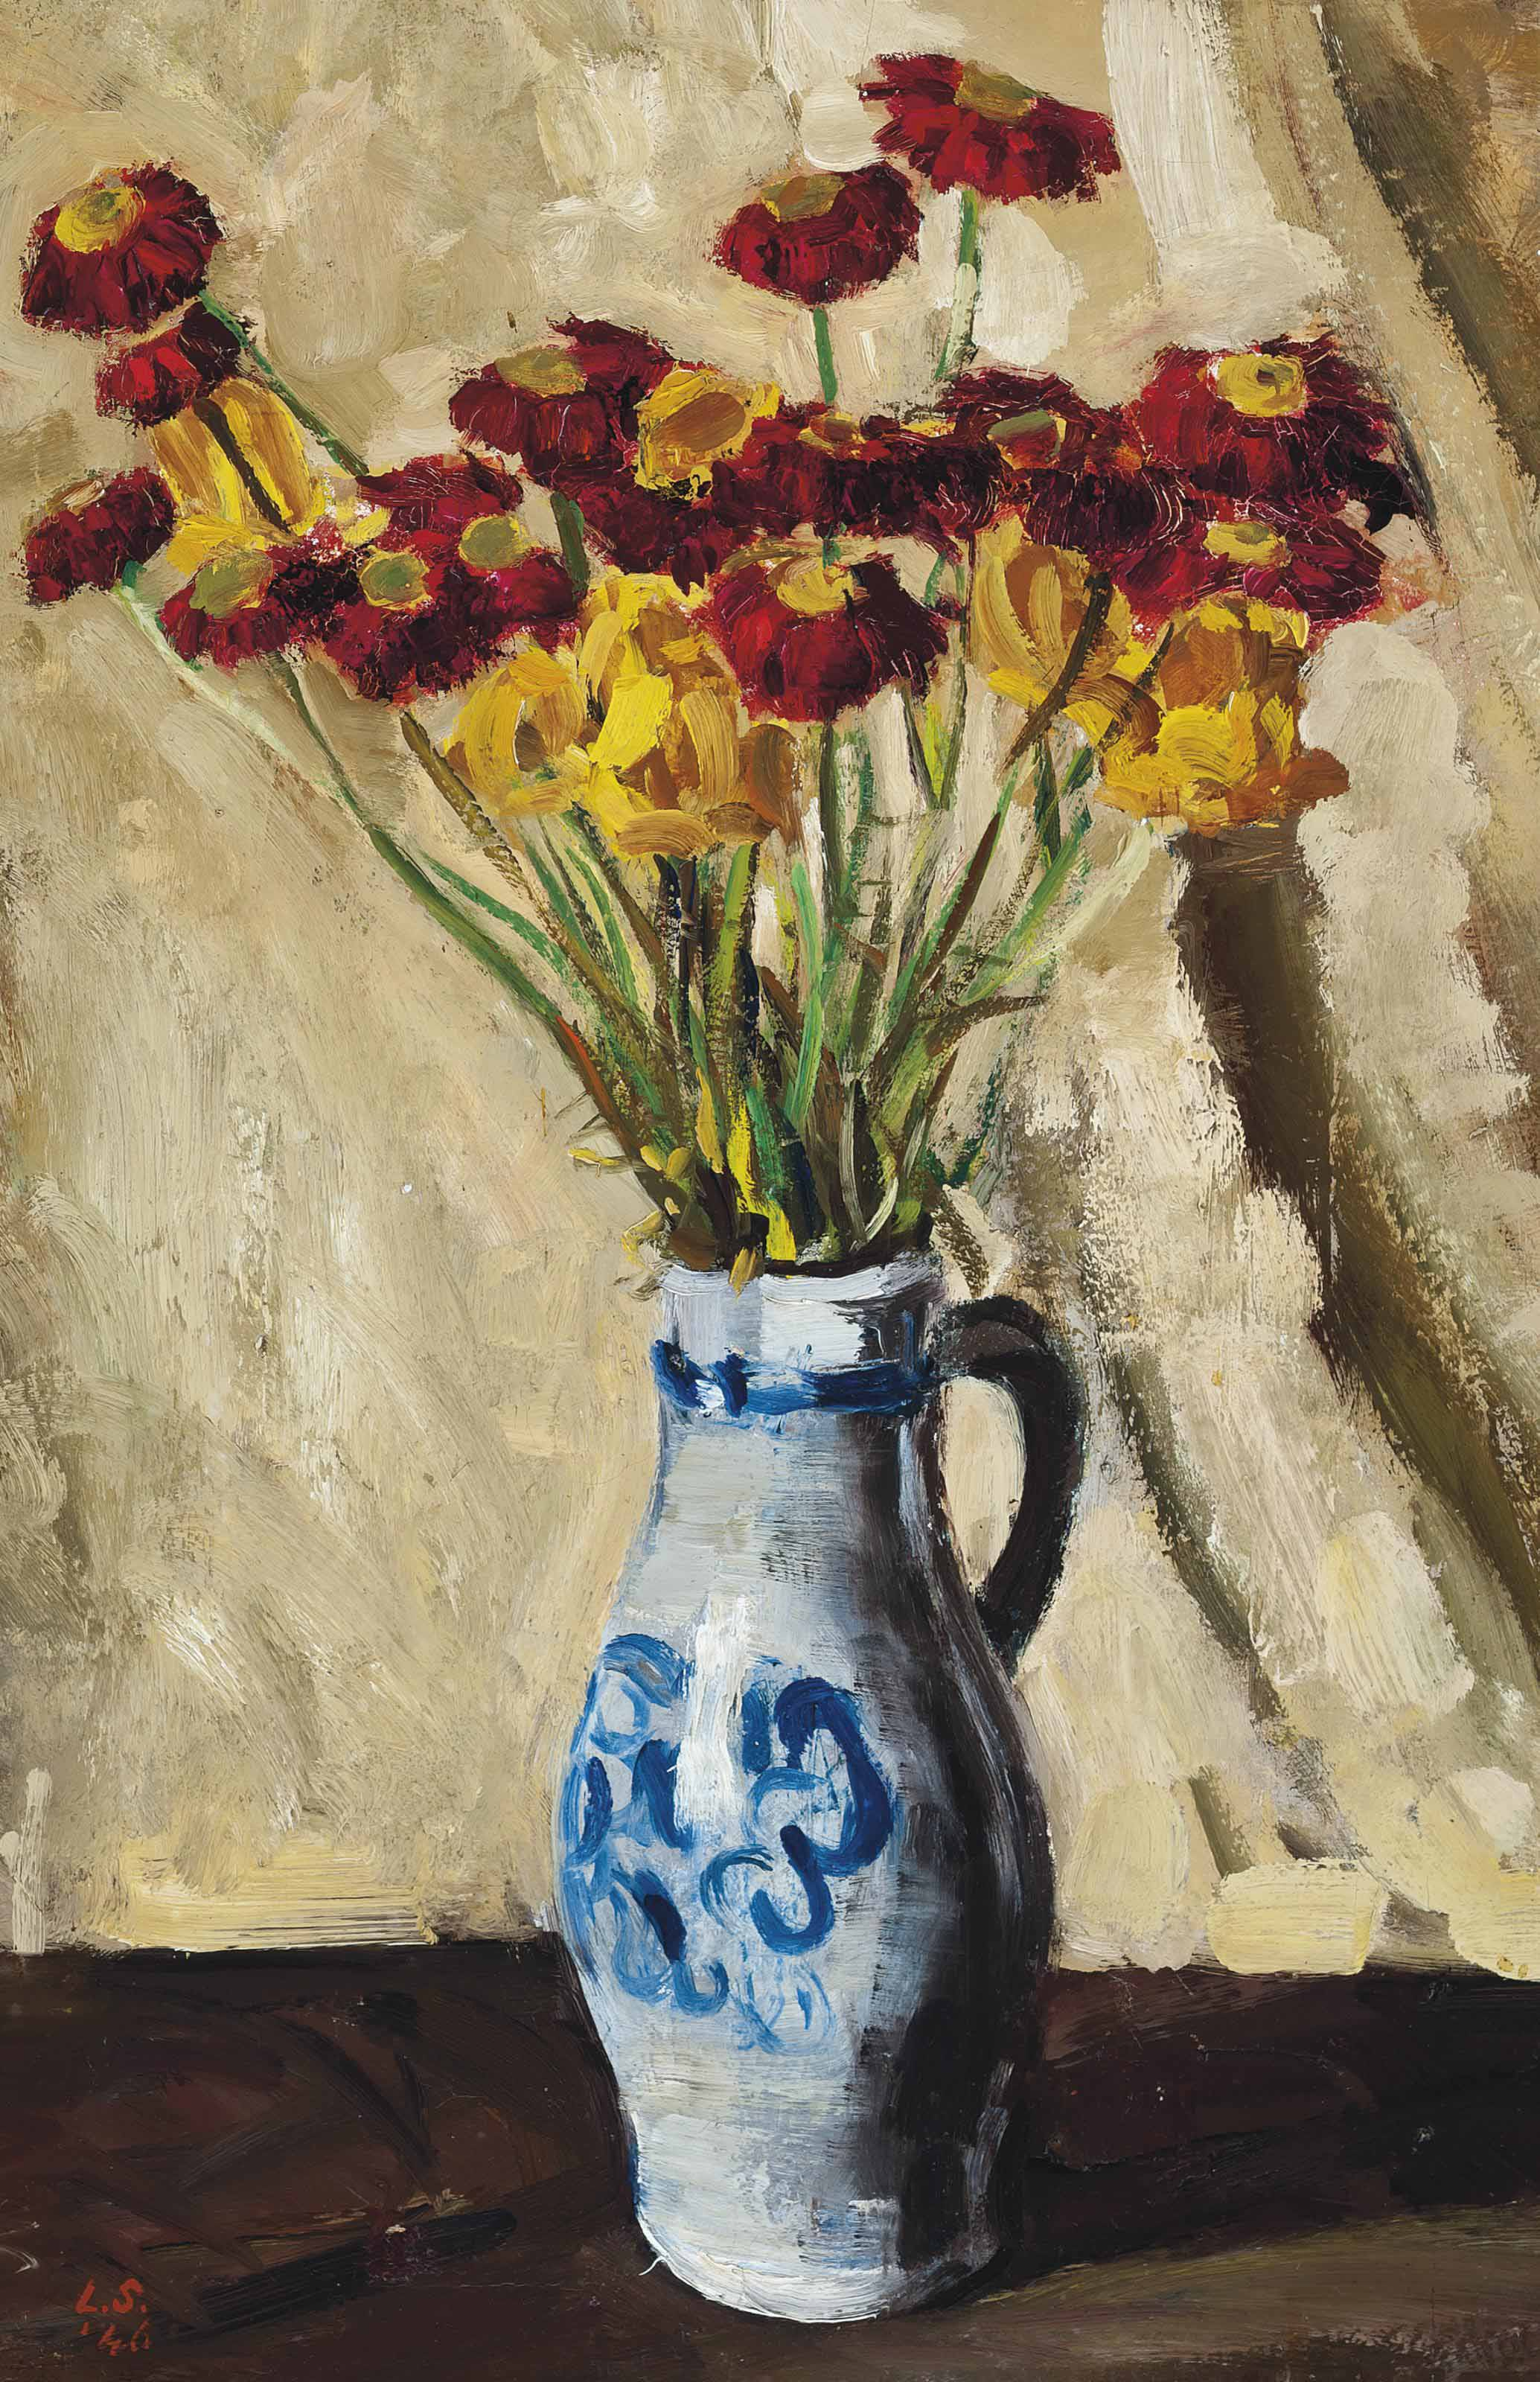 Vase of autumnal flowers